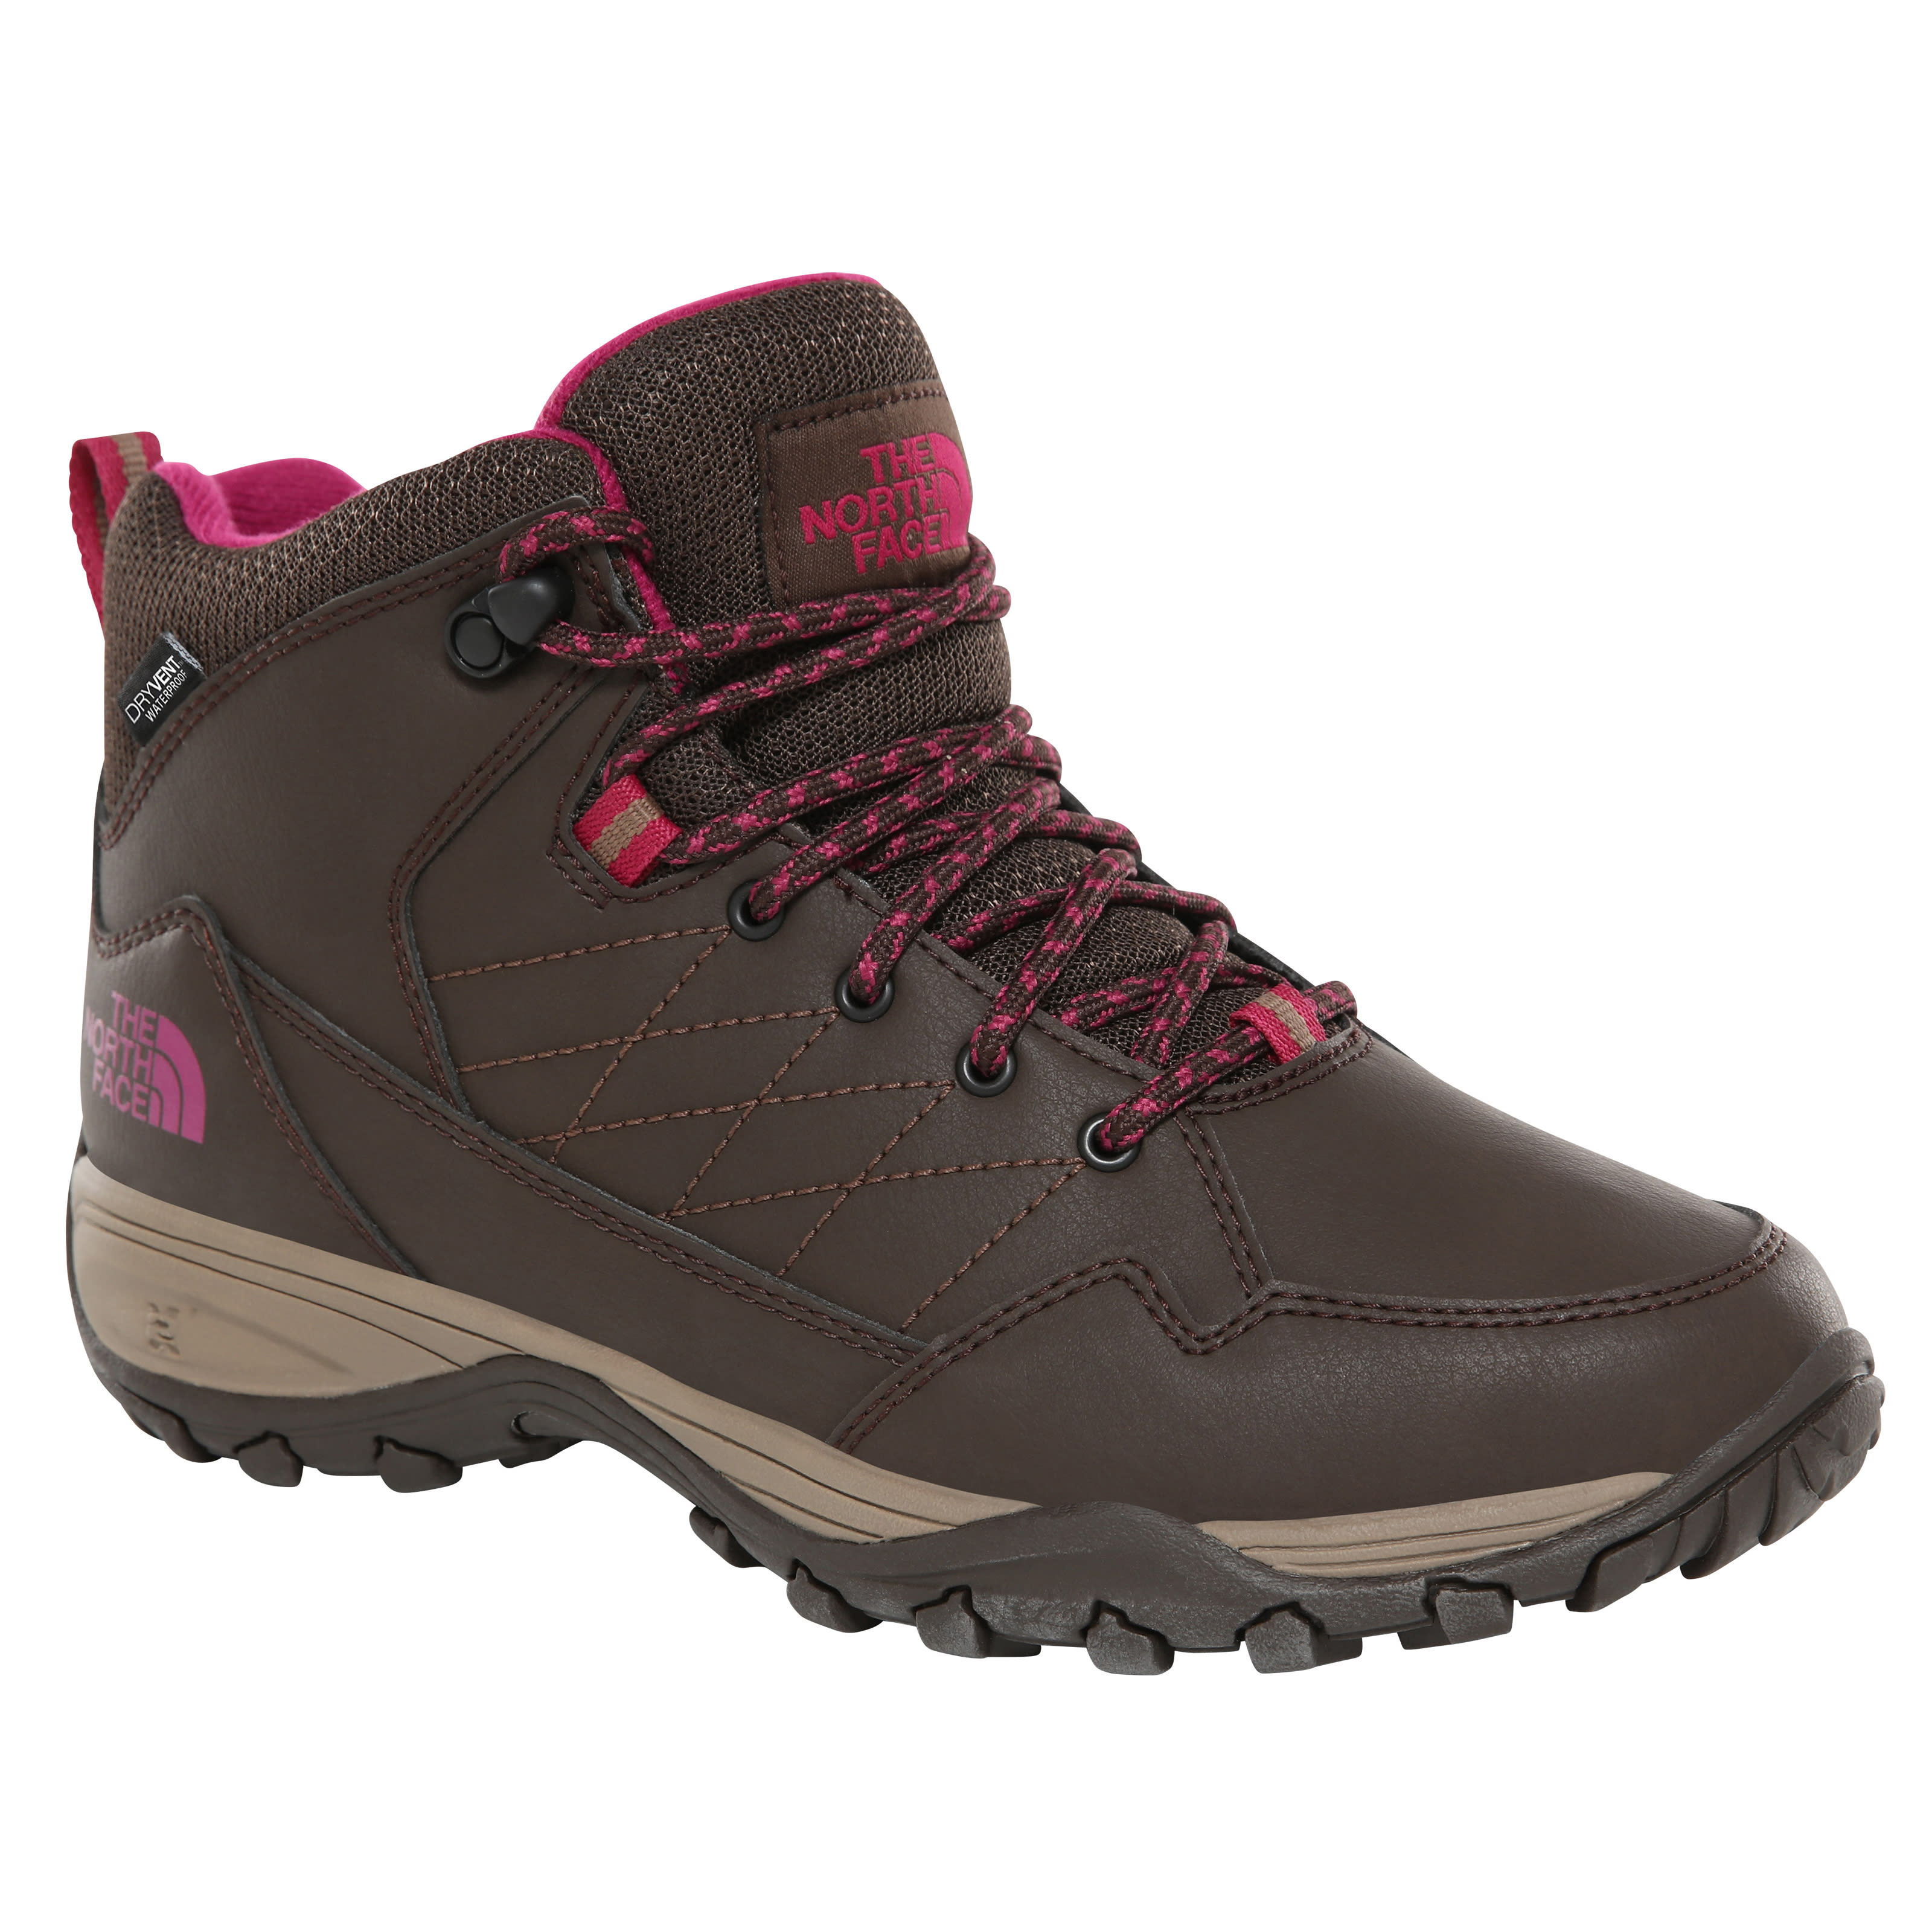 Women's Storm Strike II Hike Boots